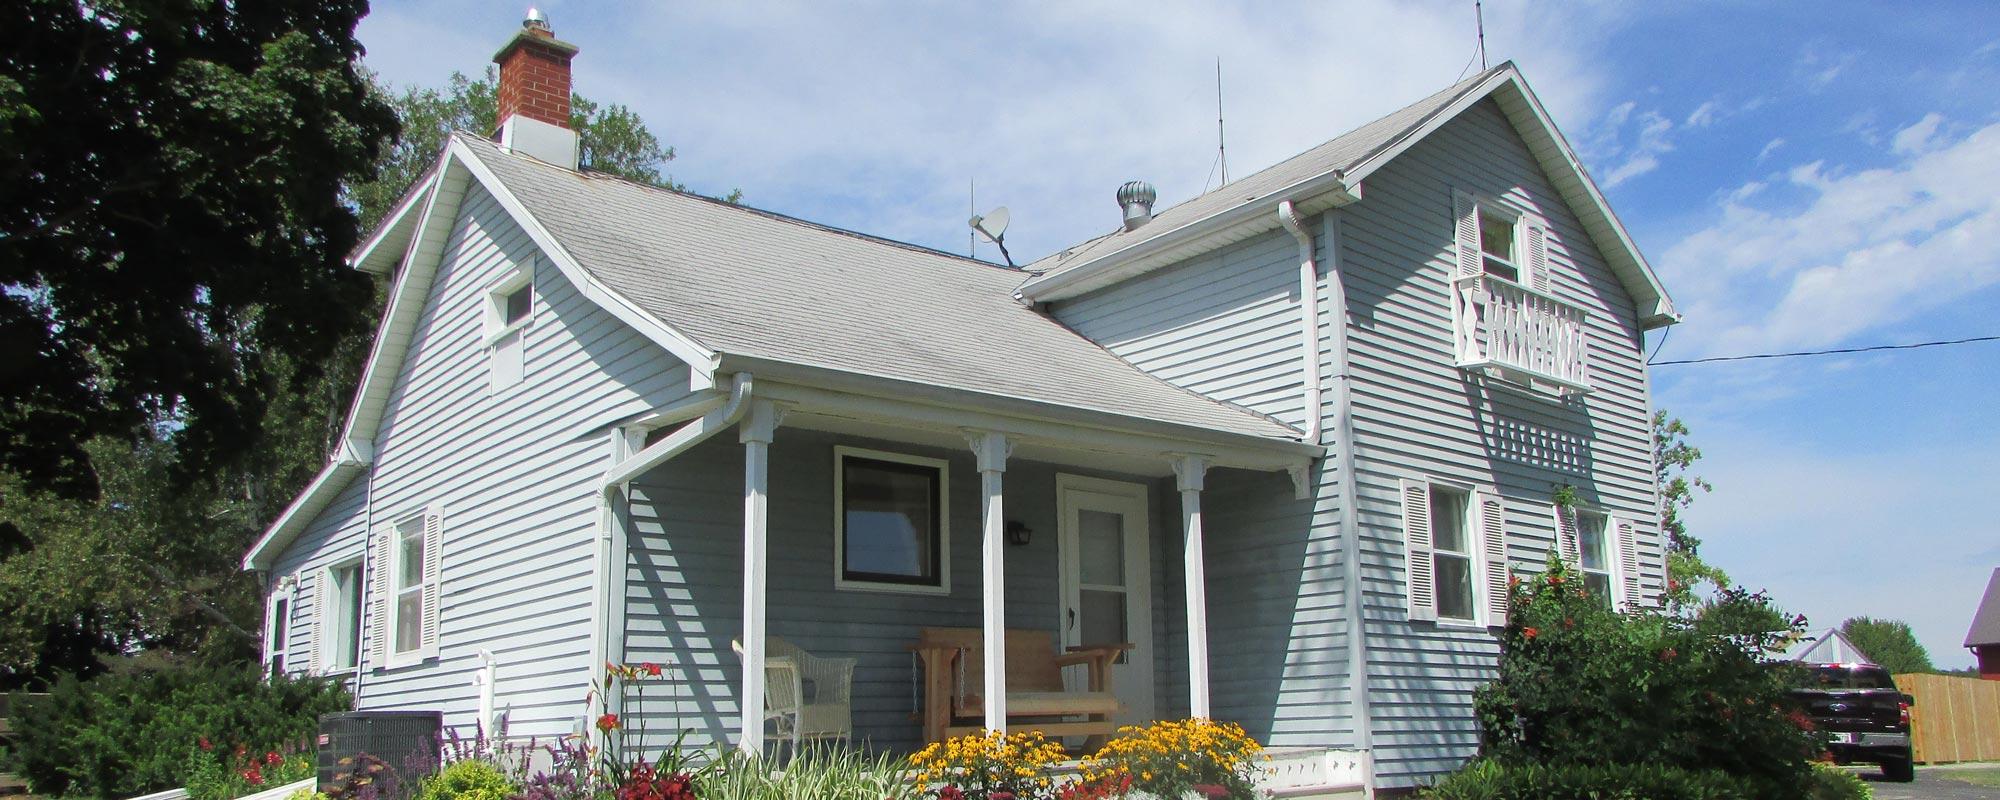 Ancestry Acres house